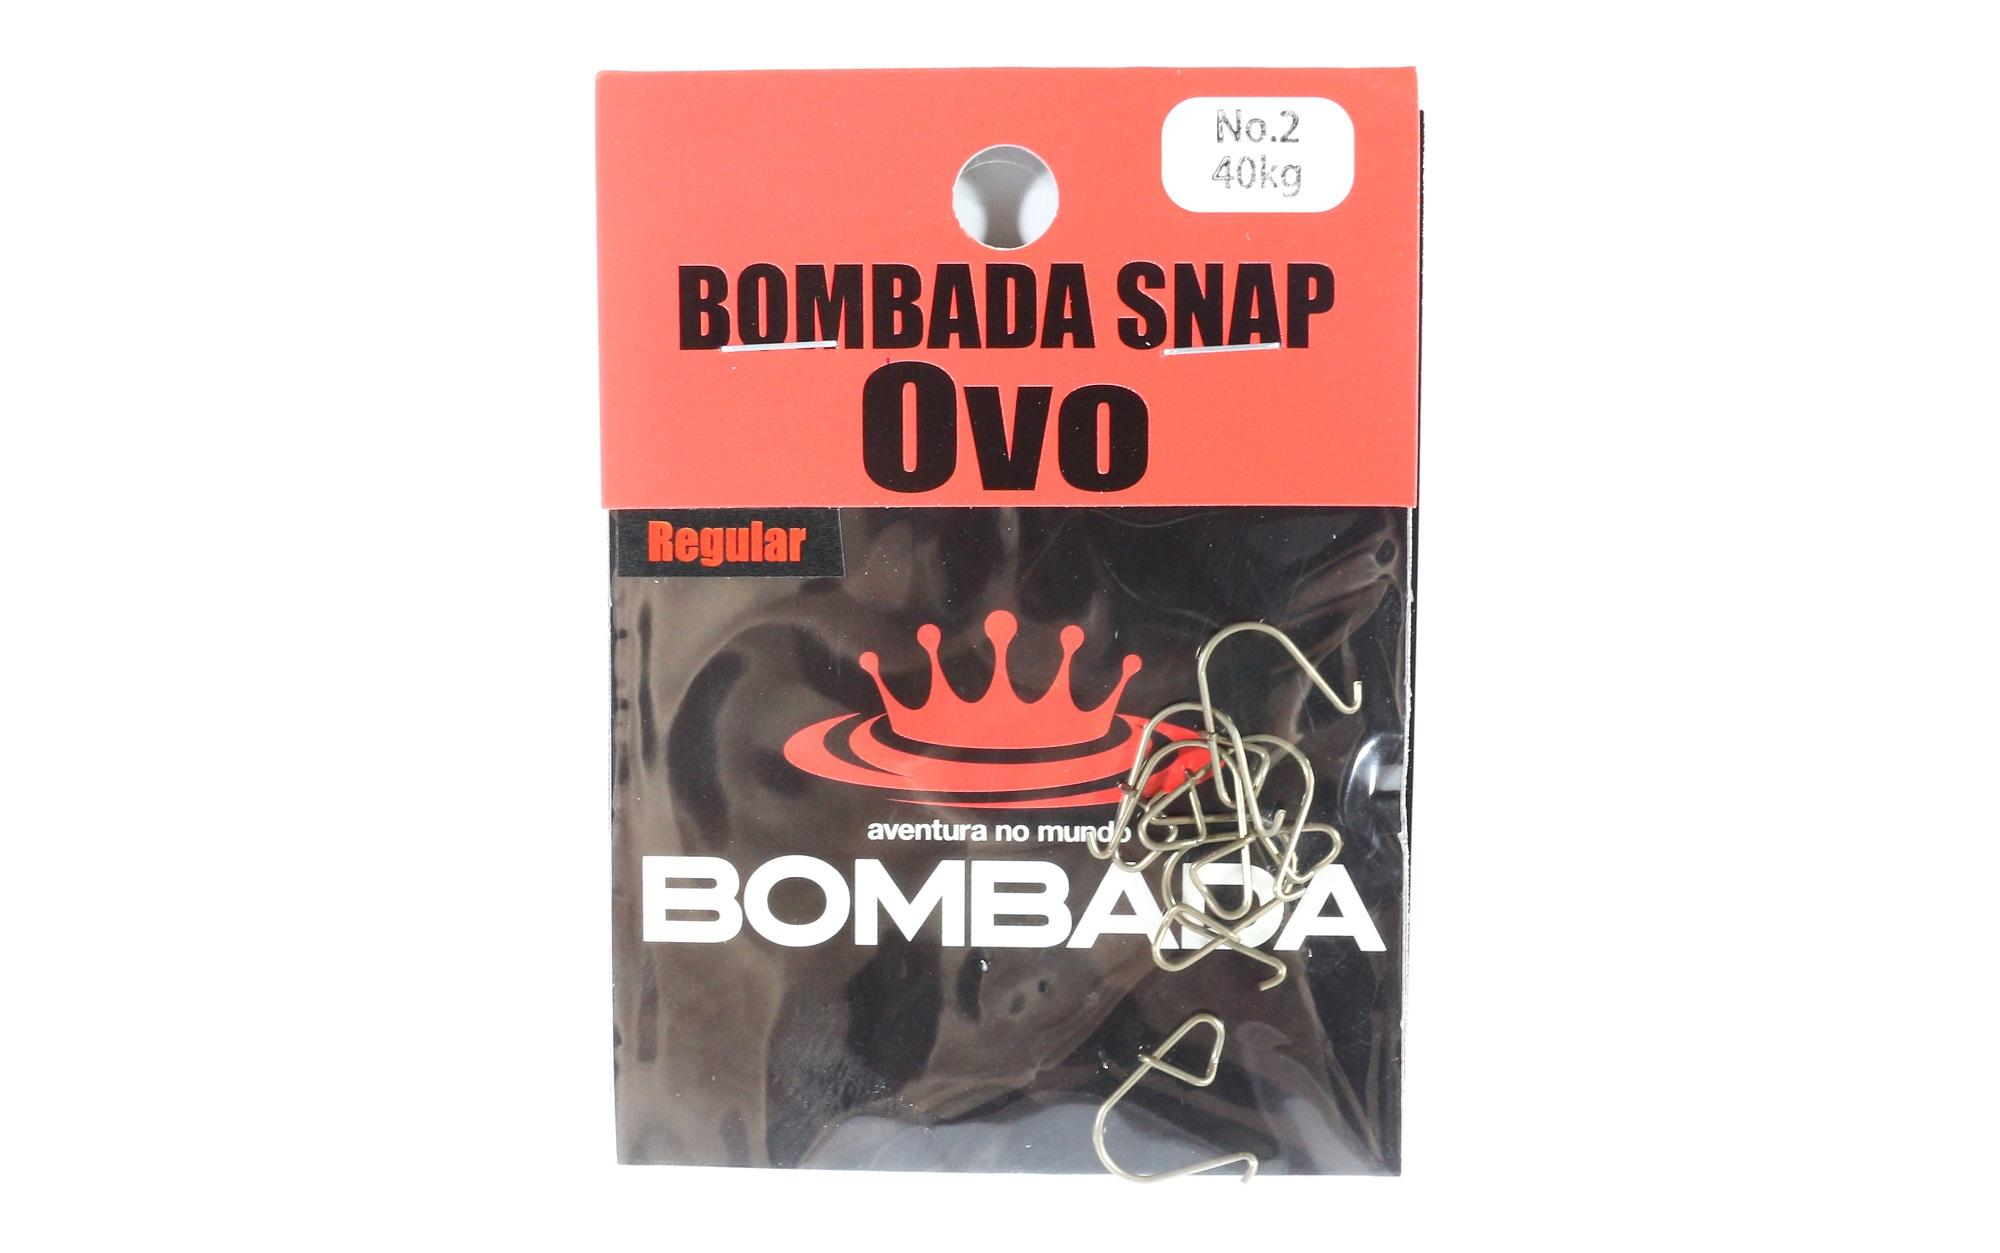 Bombada Lure Snap Ovo Regular Pack Heavy Duty Size 2 (1126)